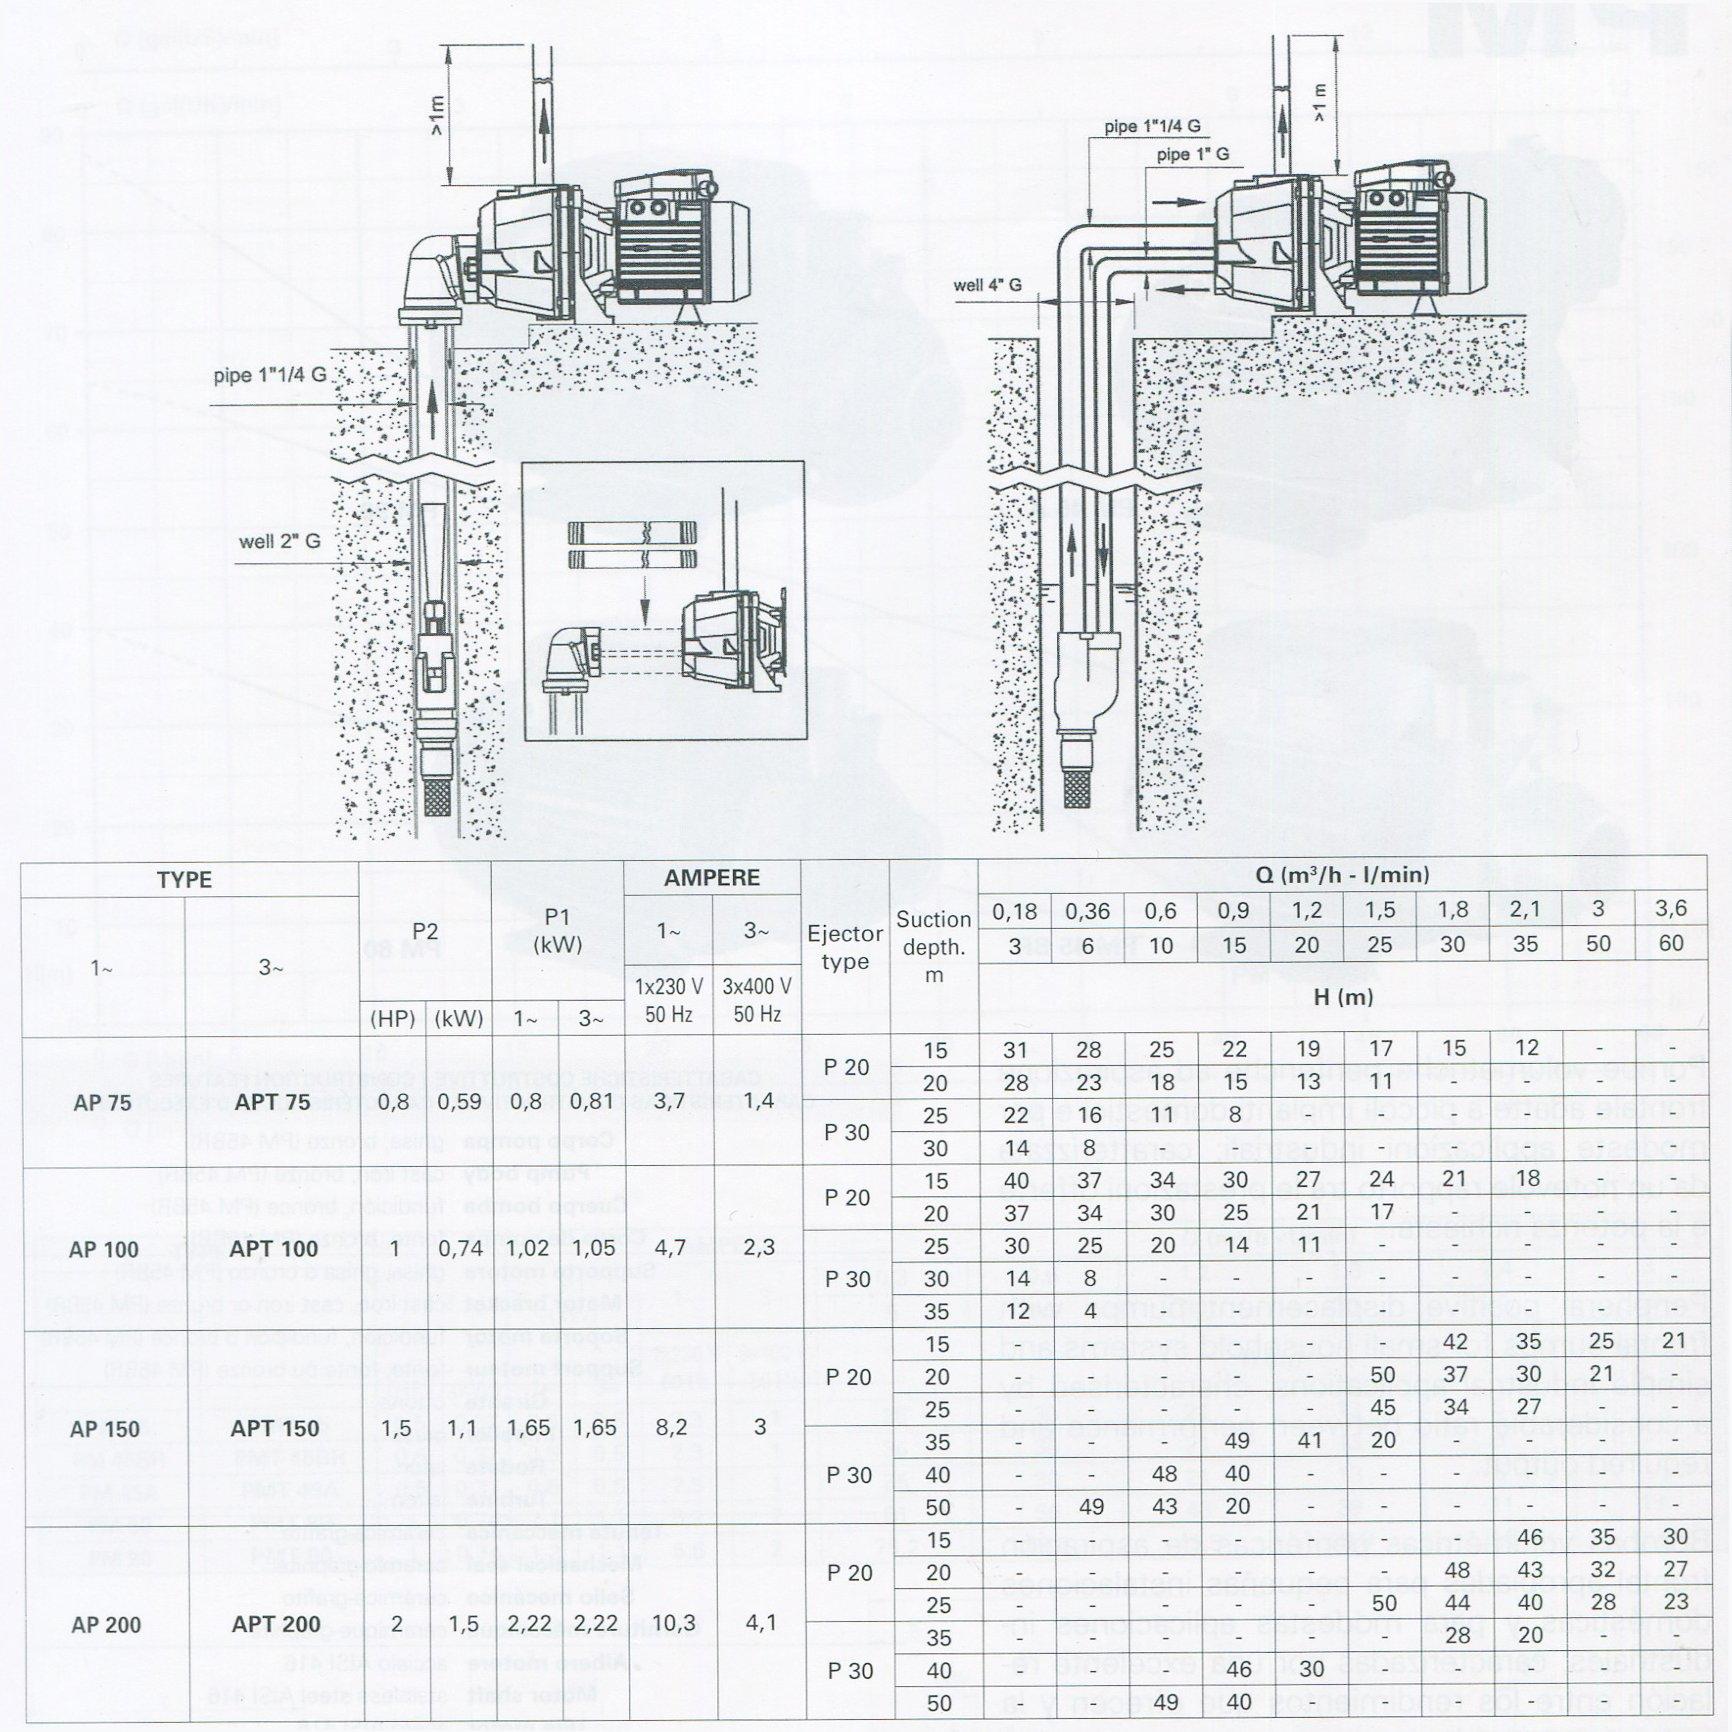 https://maybompentax.com.vn/images/2013/12/May-bom-pentax-trang15-duong-dac-tinh-01.jpg